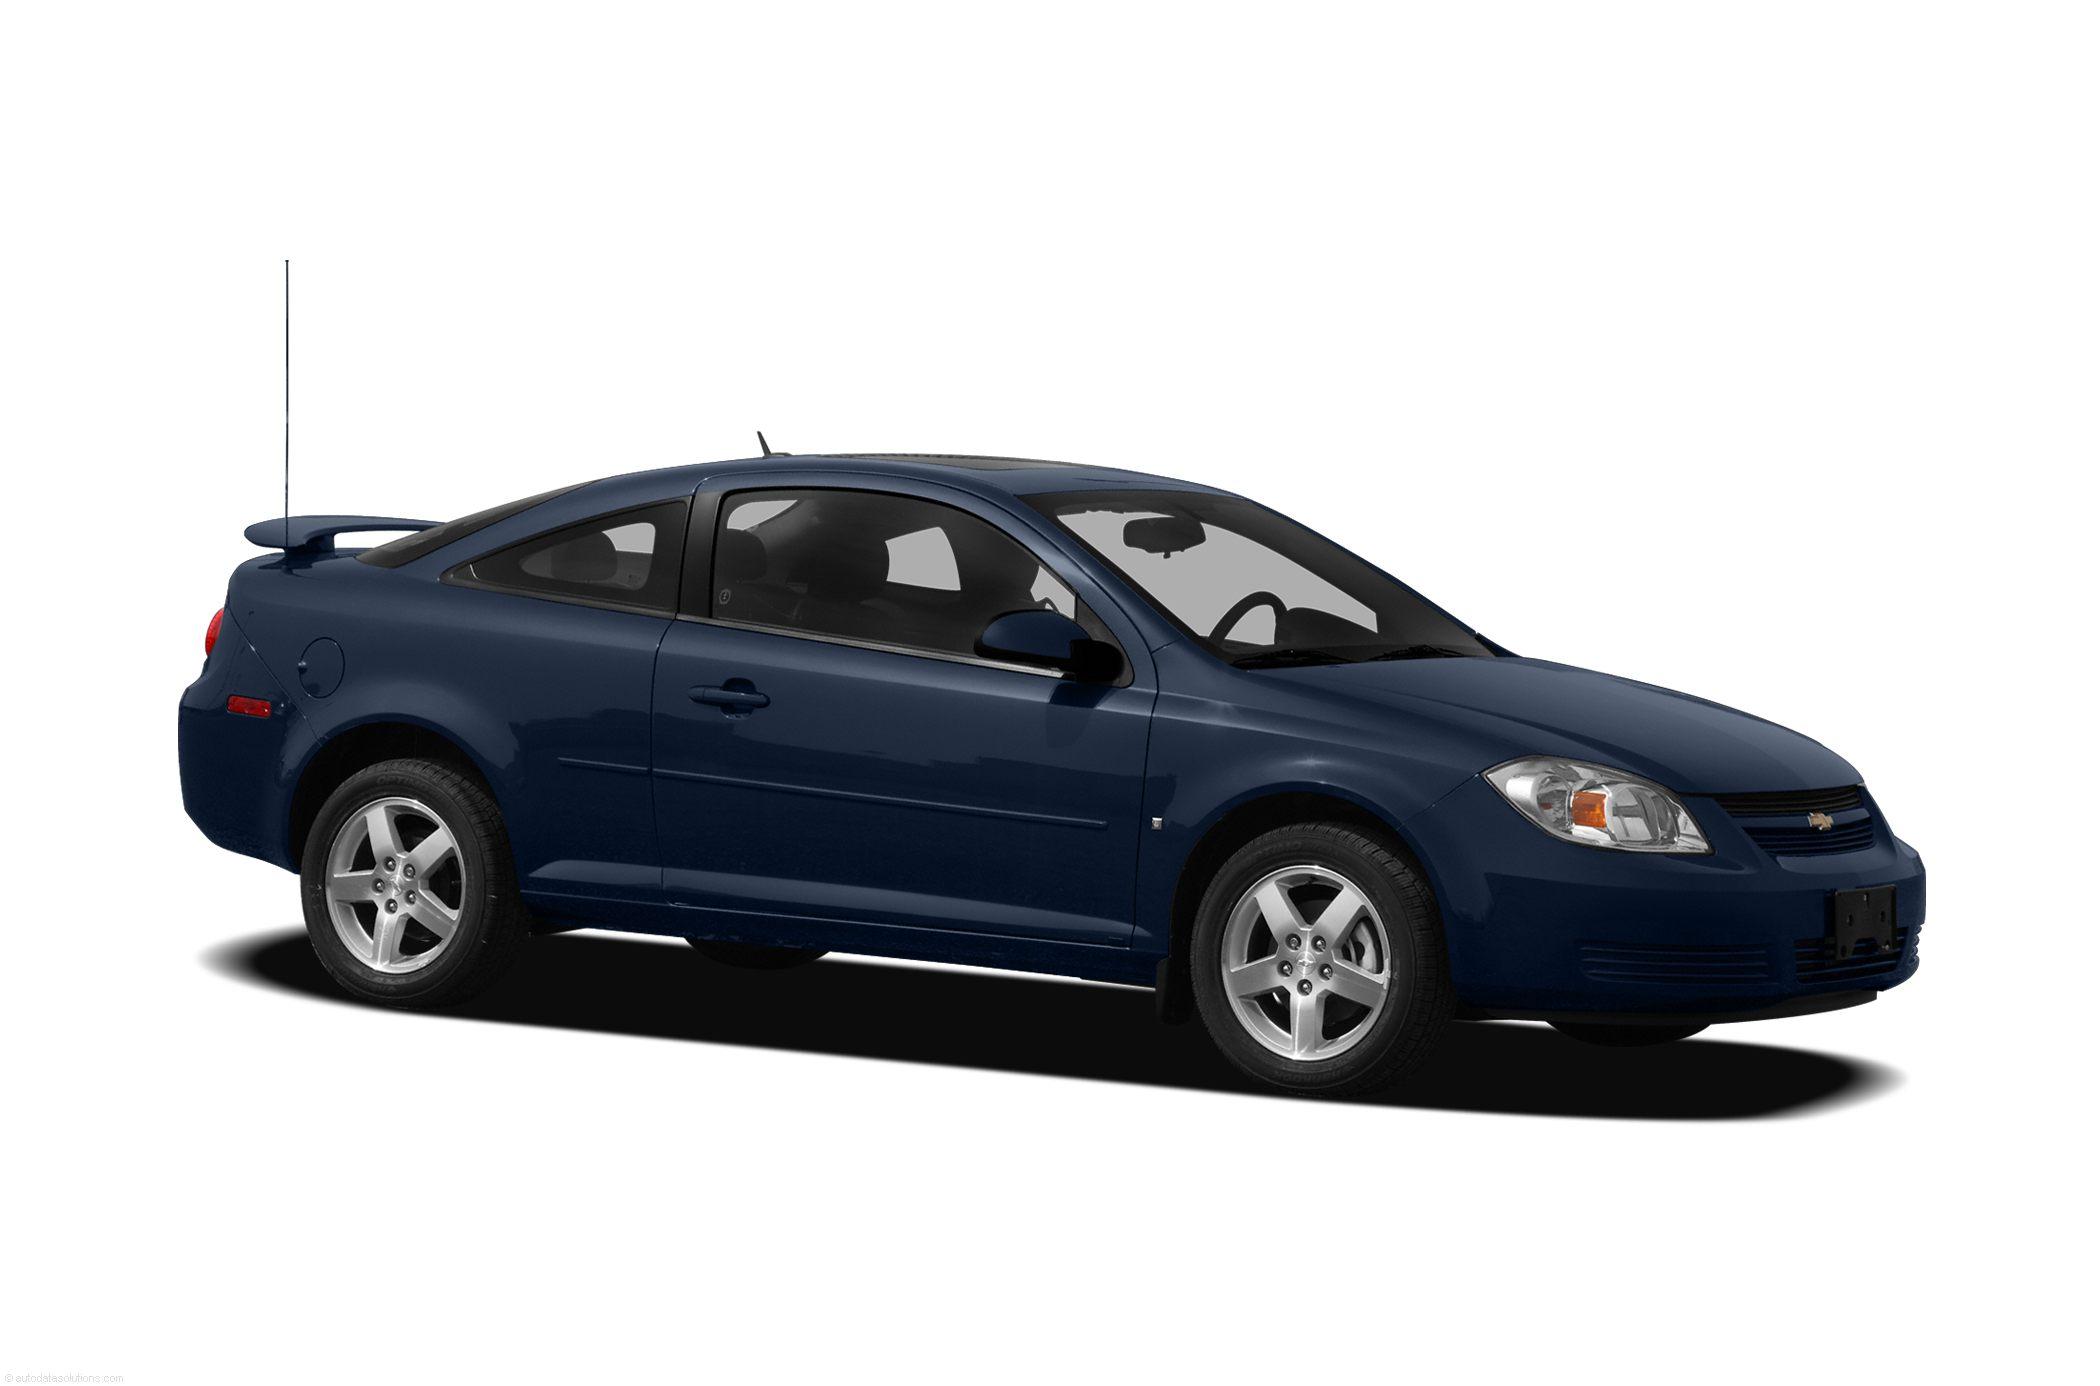 2010 Chevrolet Cobalt #13 Chevrolet Cobalt #13